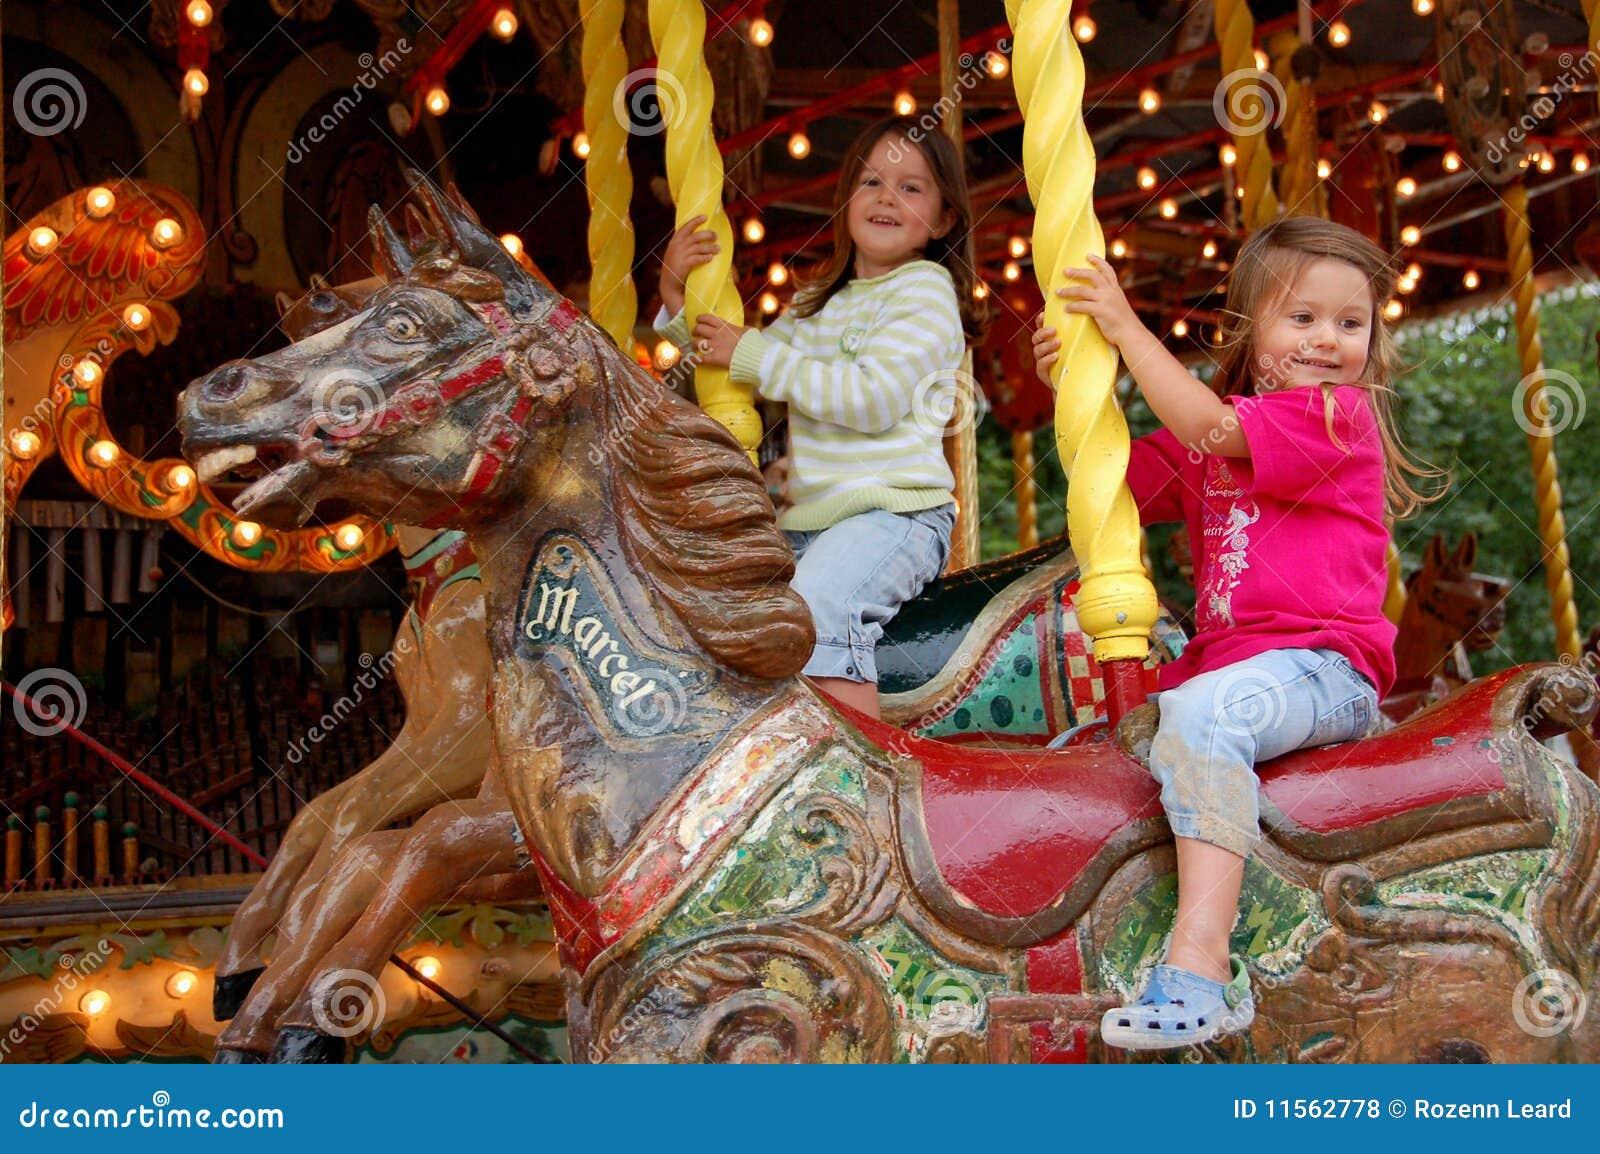 Old style merry-go-round